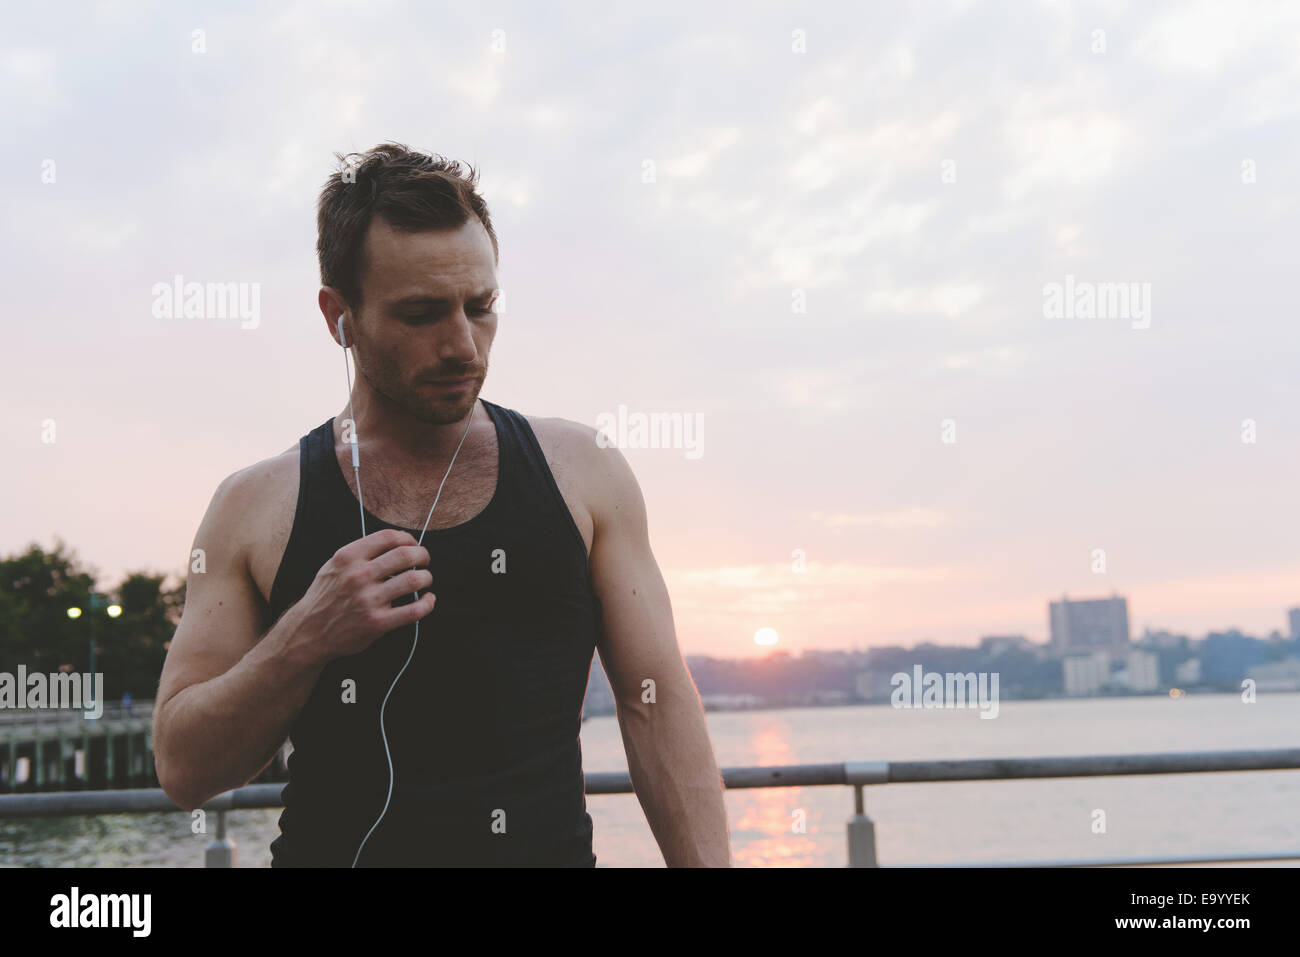 Macho joven runner escuchando auriculares en Riverside al amanecer. Imagen De Stock